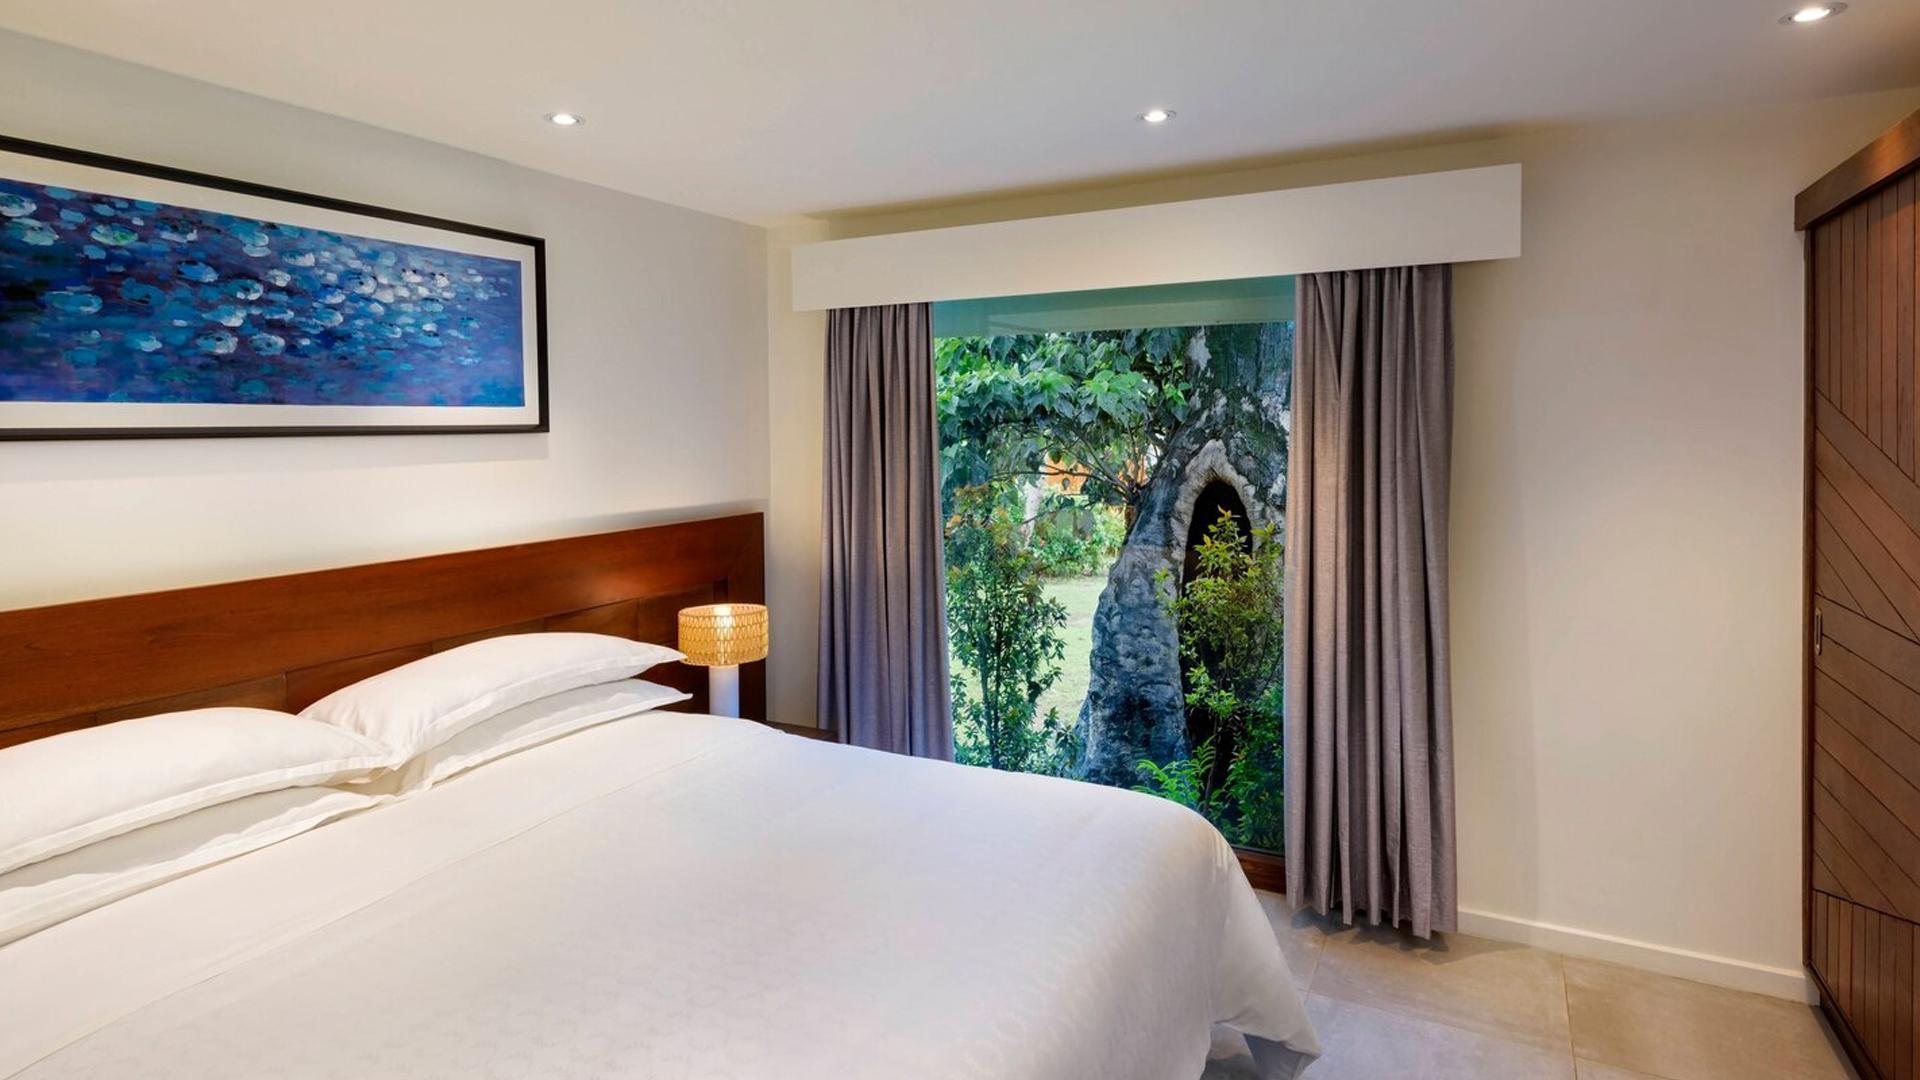 Island View Family Suite image 1 at Sheraton Resort & Spa, Tokoriki Island, Fiji by null, null, Fiji